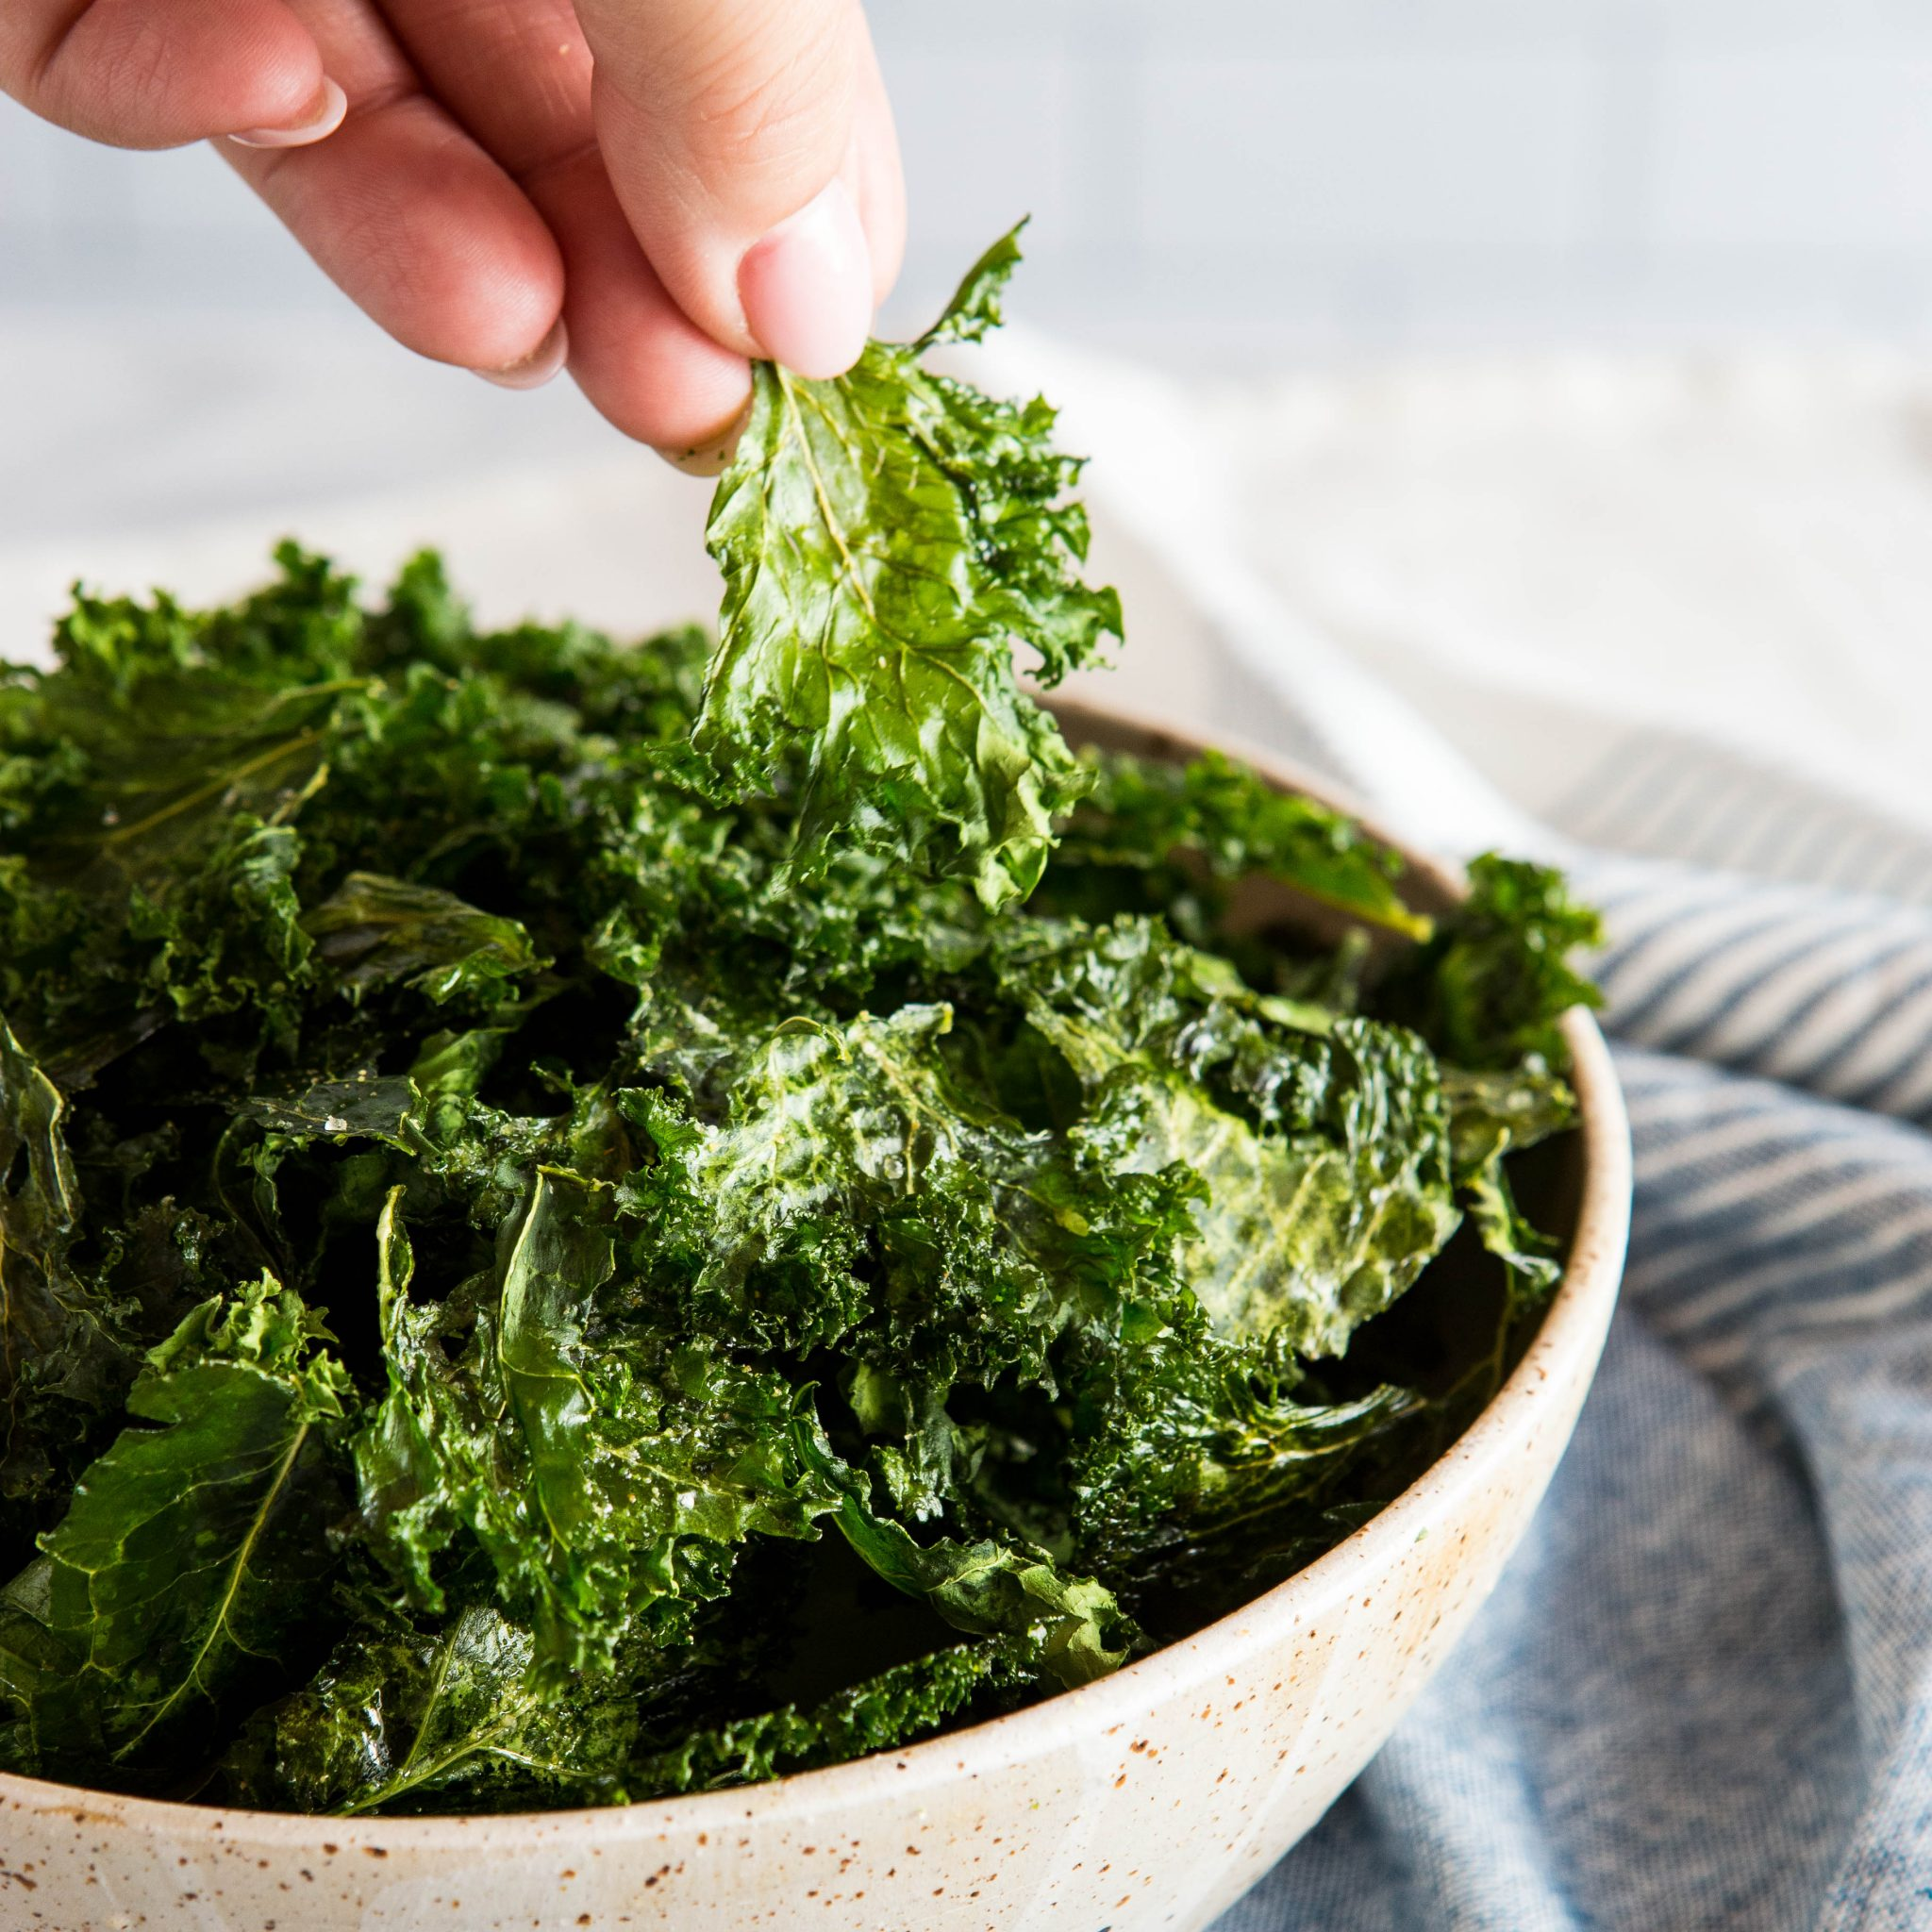 kale chips recipe garlic powder No Fail Sea Salt and Garlic Kale Chips - The Busy Baker